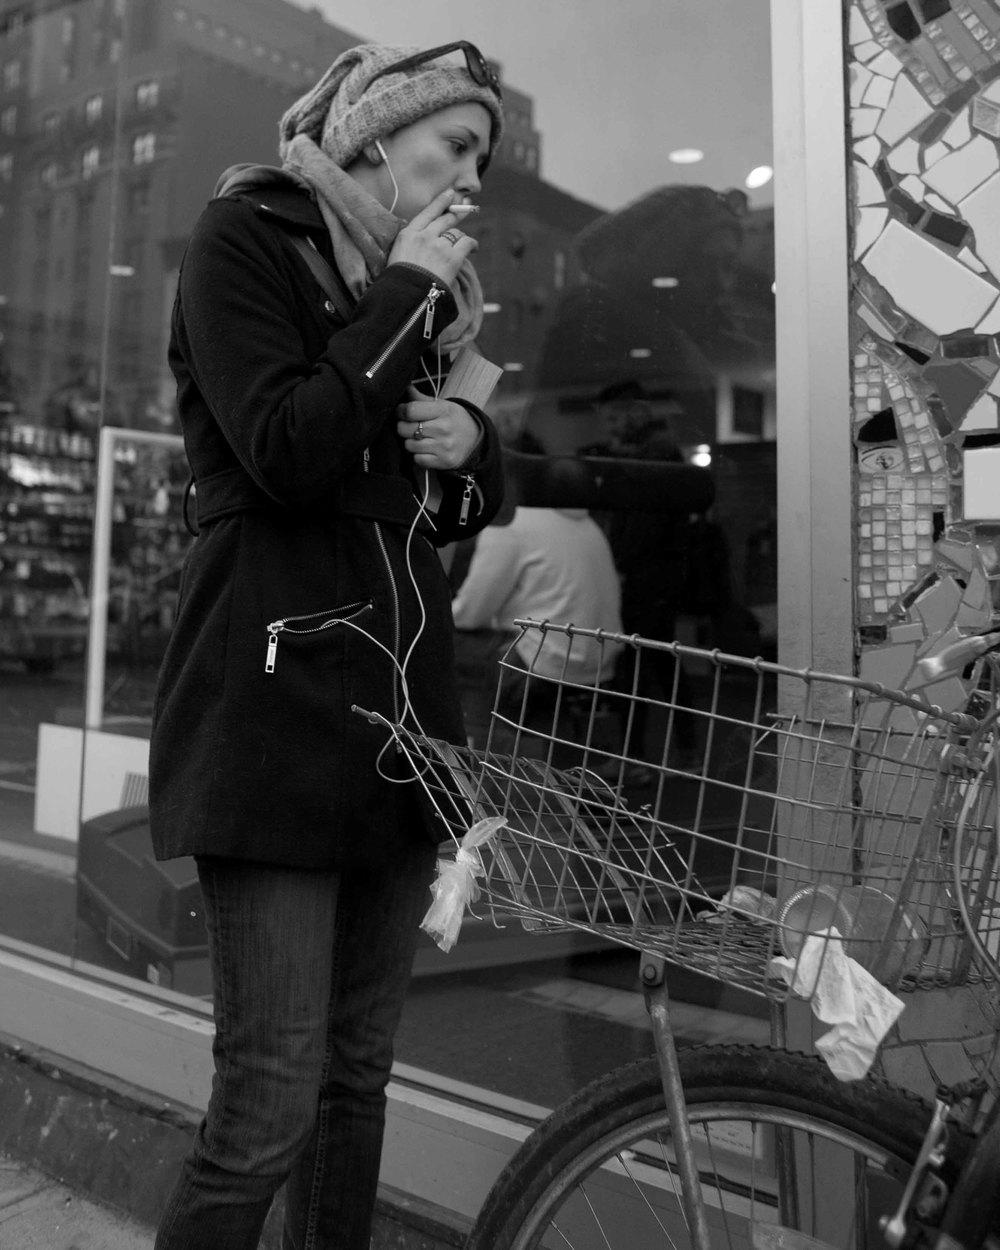 Streetphotography 3.0-59.jpg